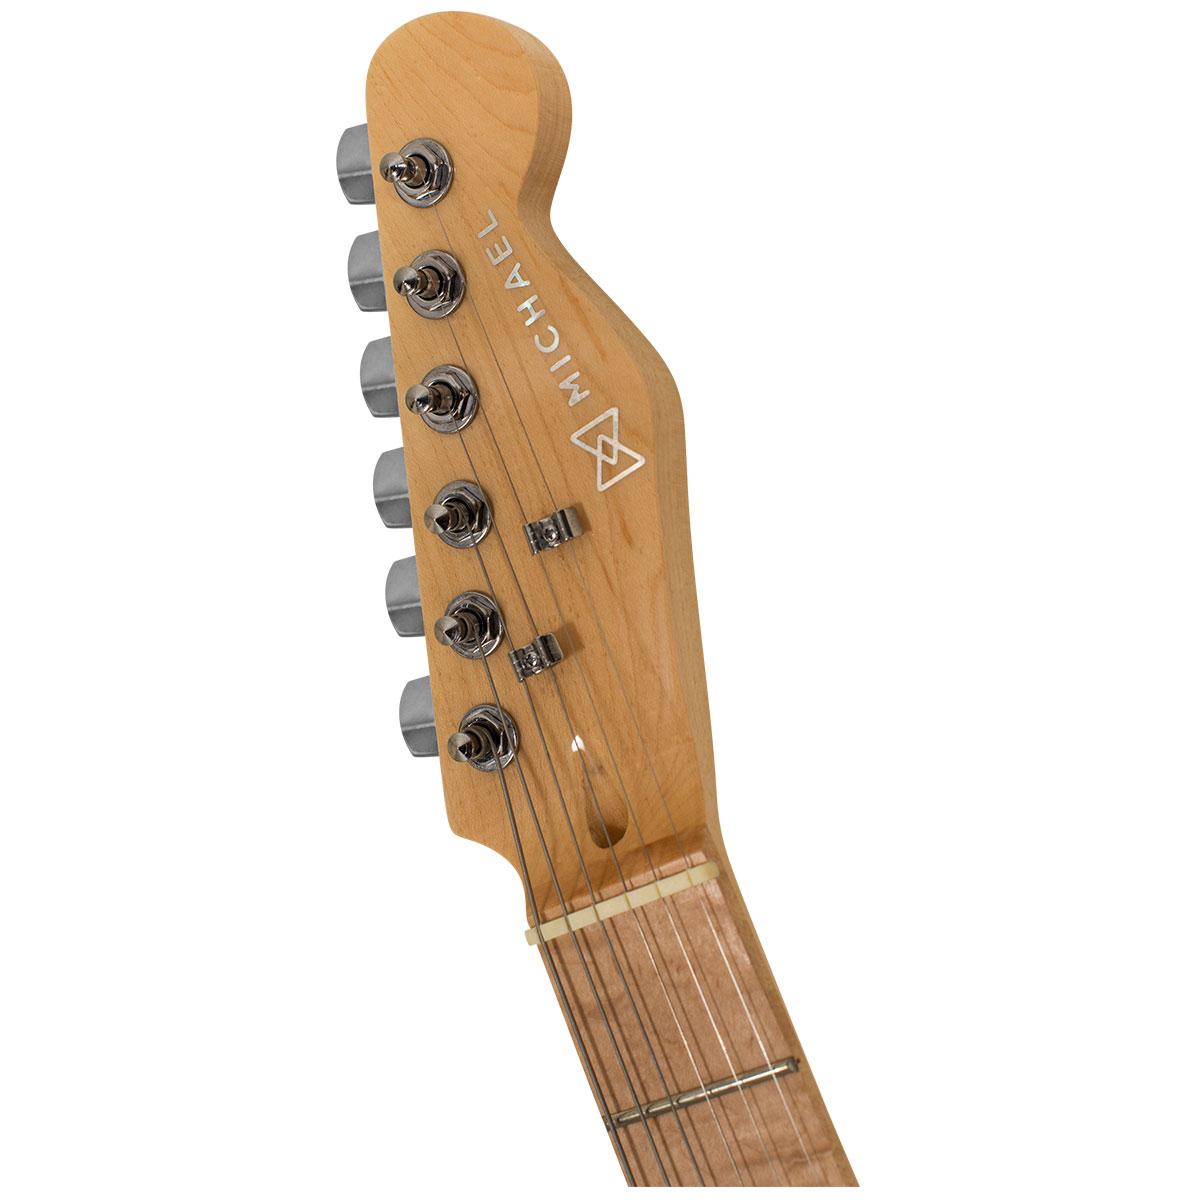 Guitarra Telecaster Slide GM385 MBK Preta Metálica - Michael